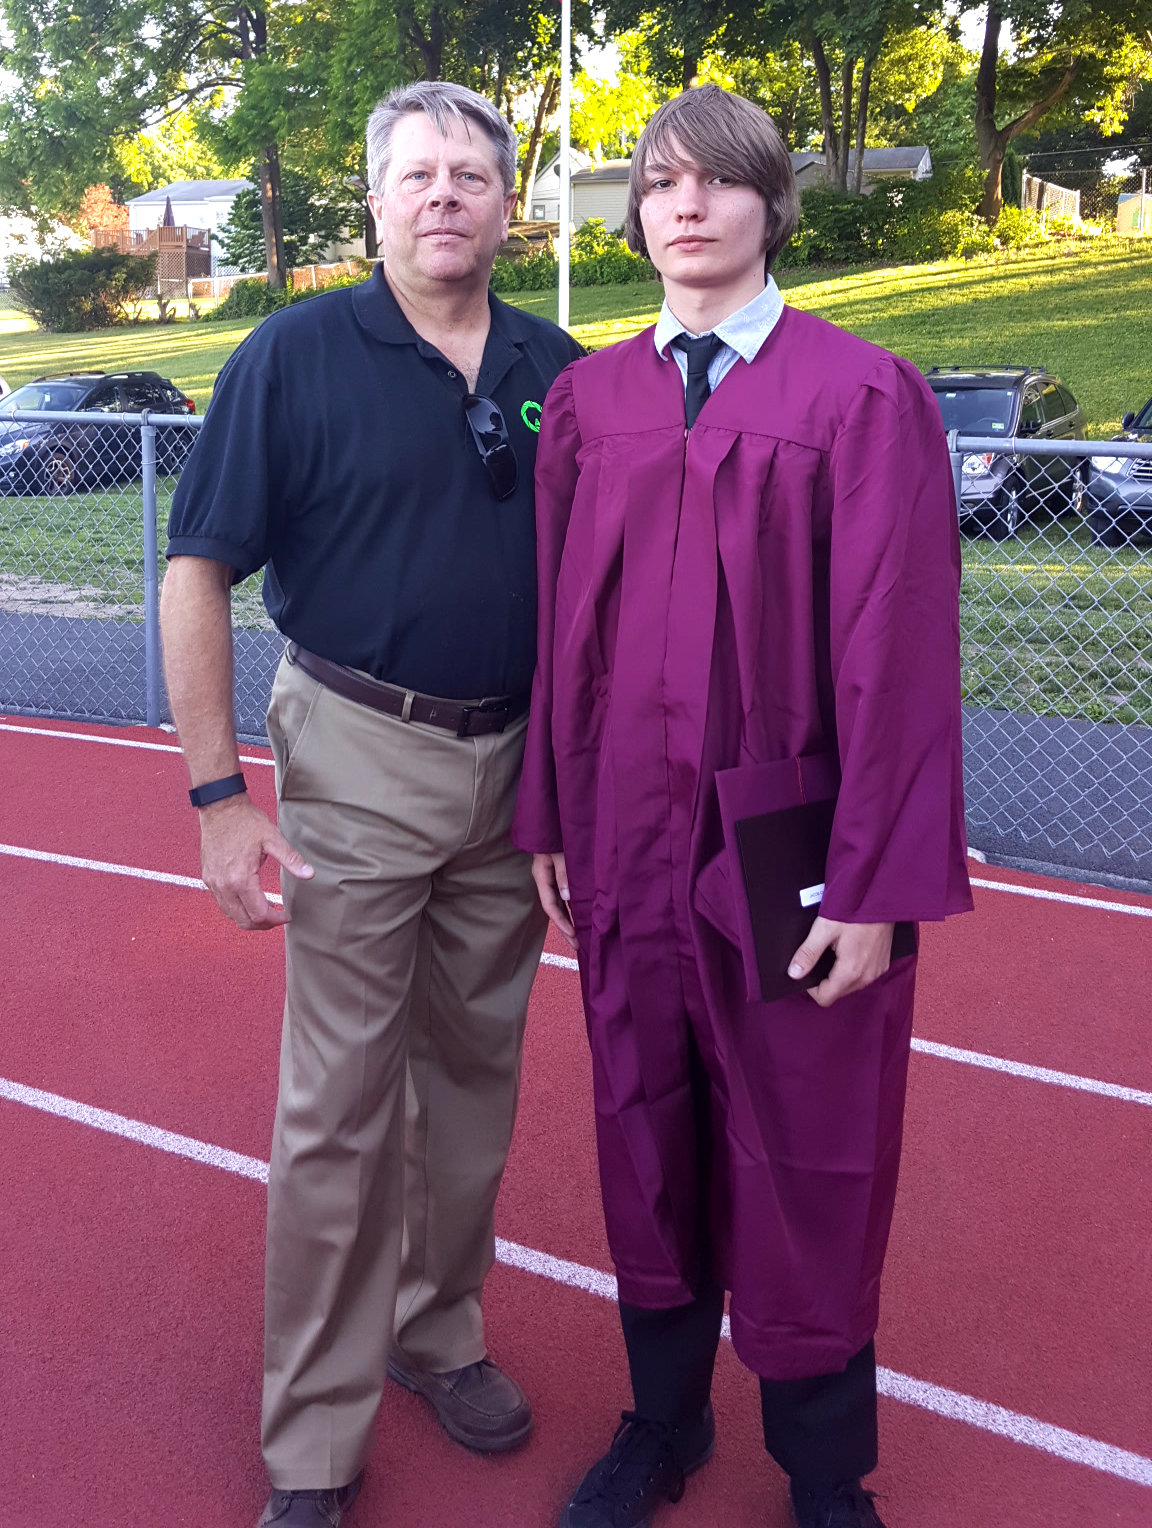 c2f40839fe64654fbdcb_Hofmann_and_Jake_graduation.jpg